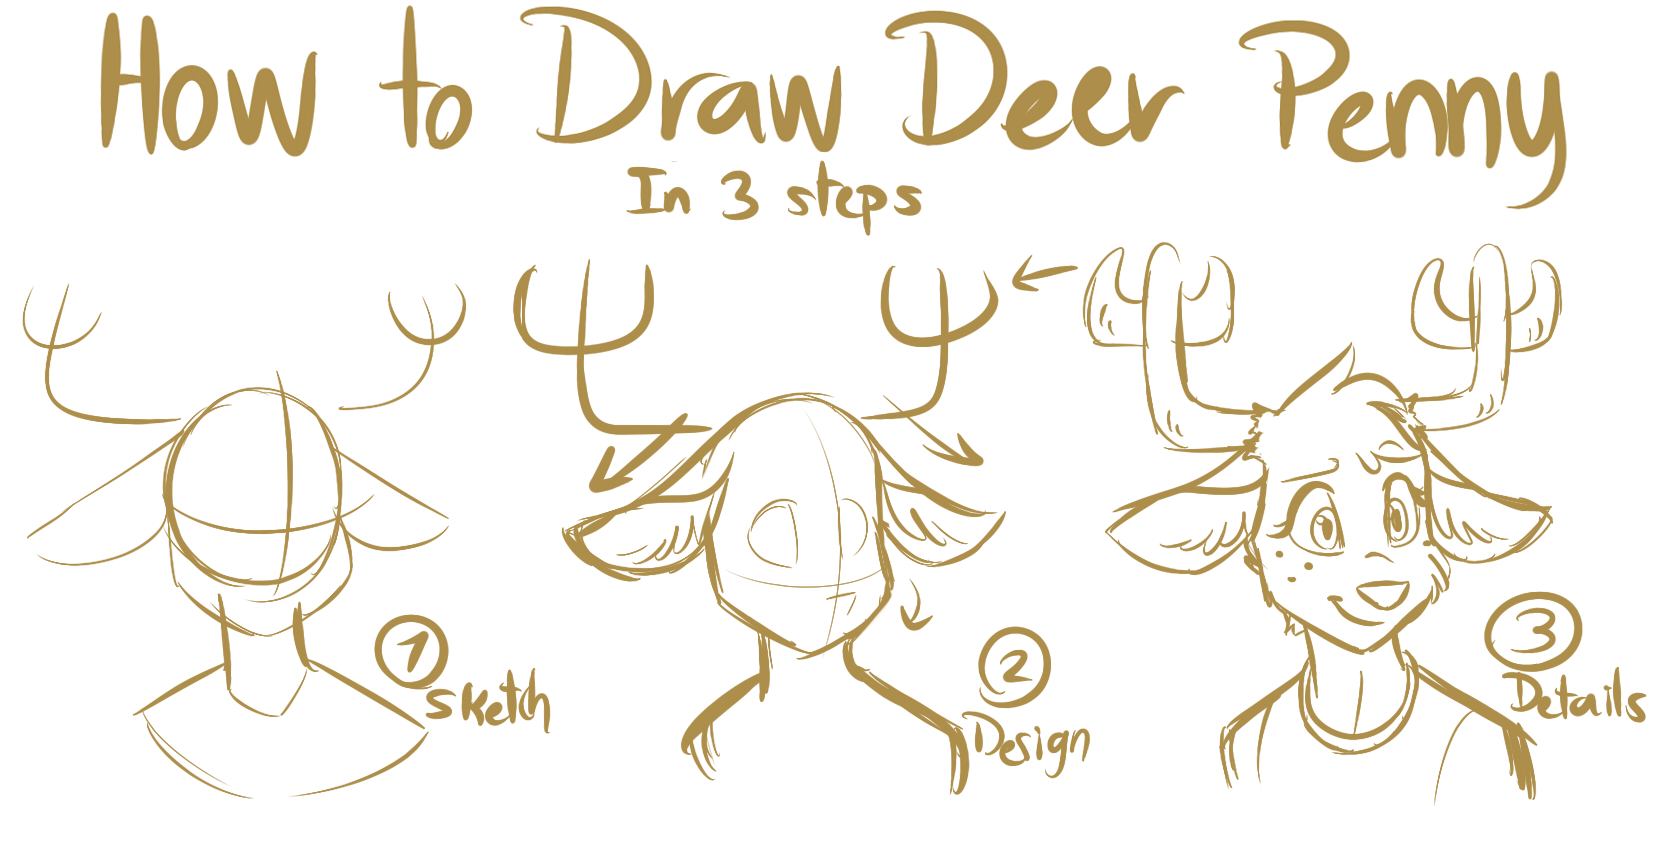 1674x844 Tawog How Draw To Deer Penny By Namygaga